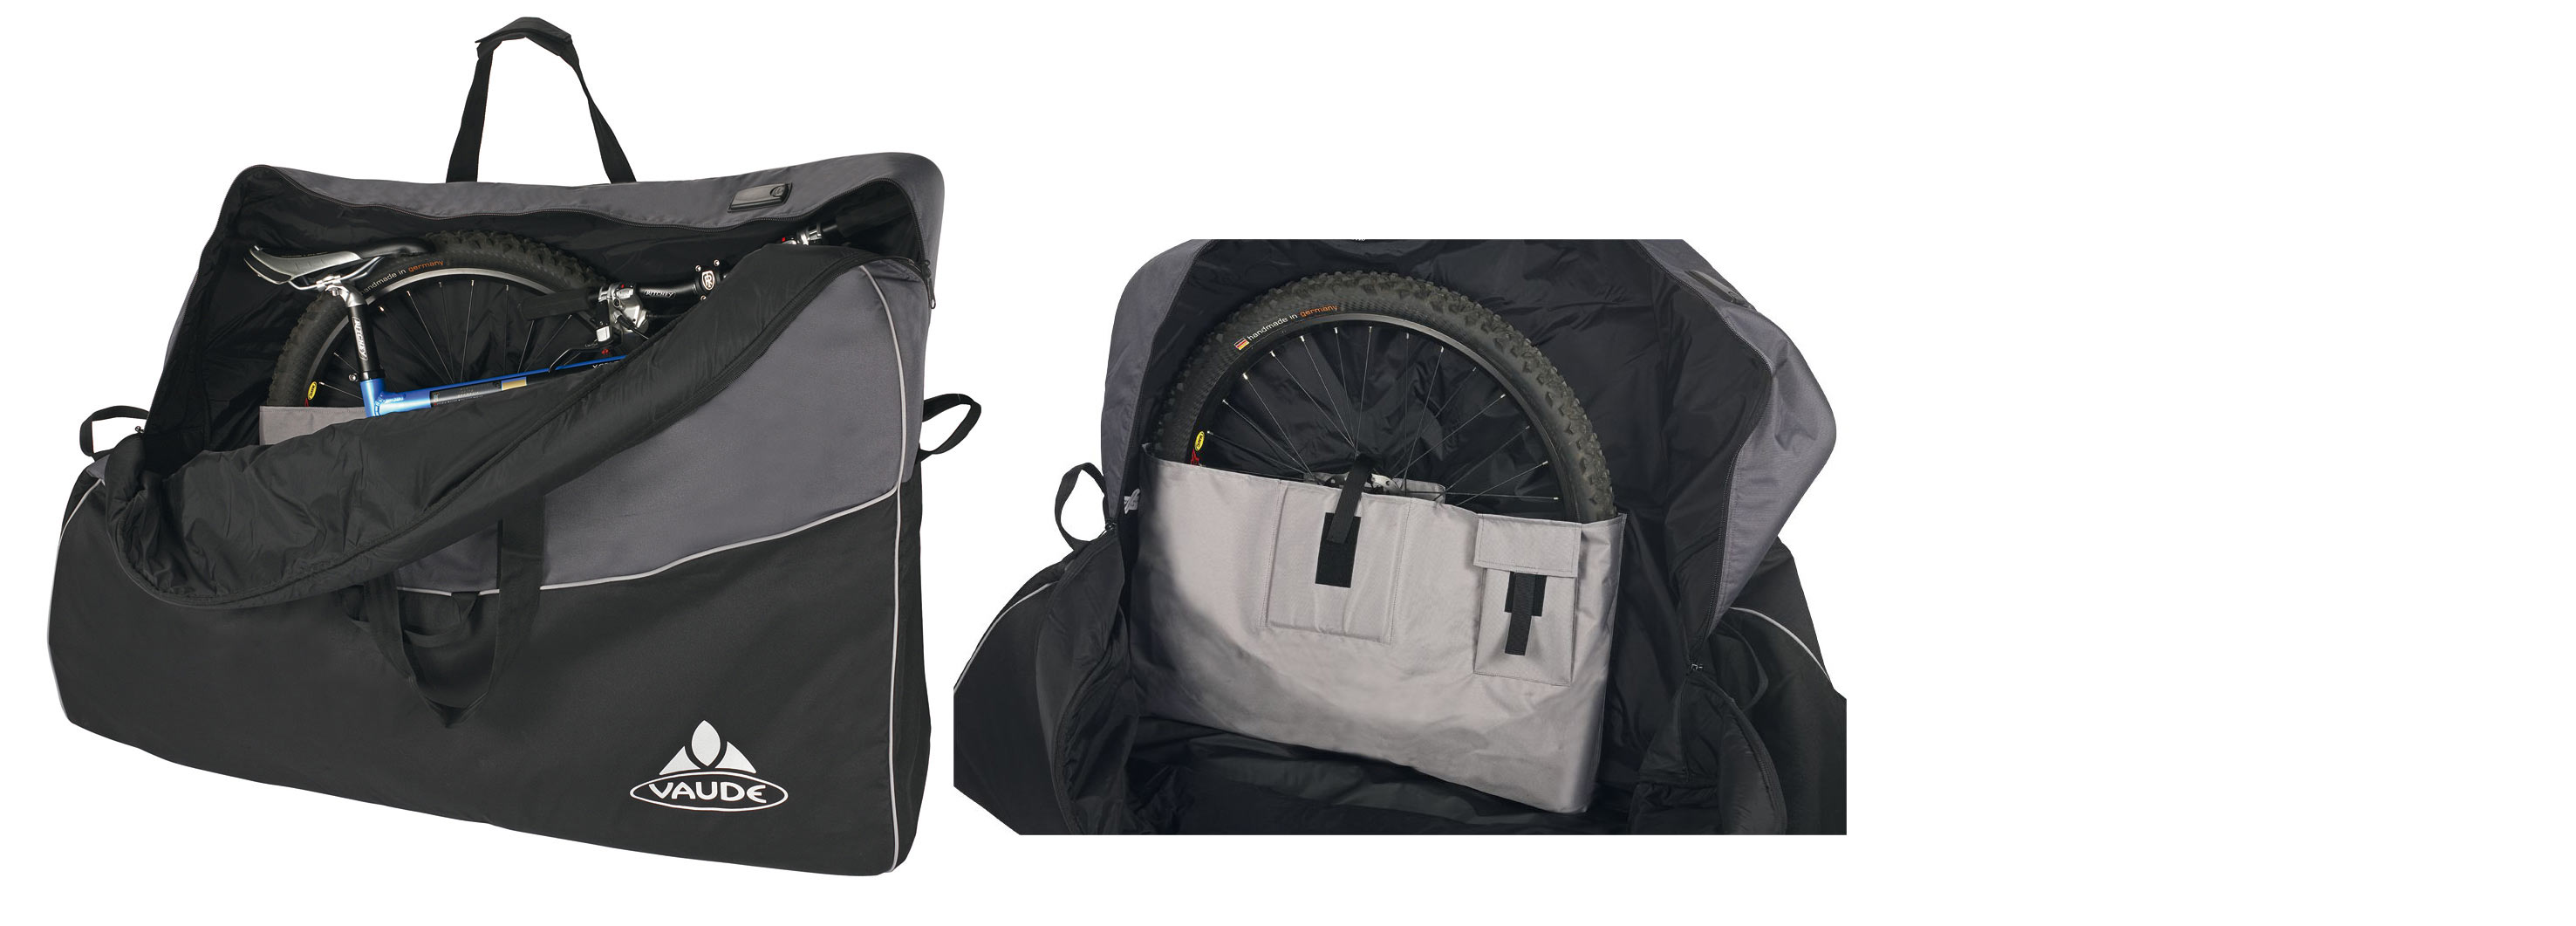 74aa4ca0177 vaude Big Bike Bag Pro - Fahrrad Transporttasche